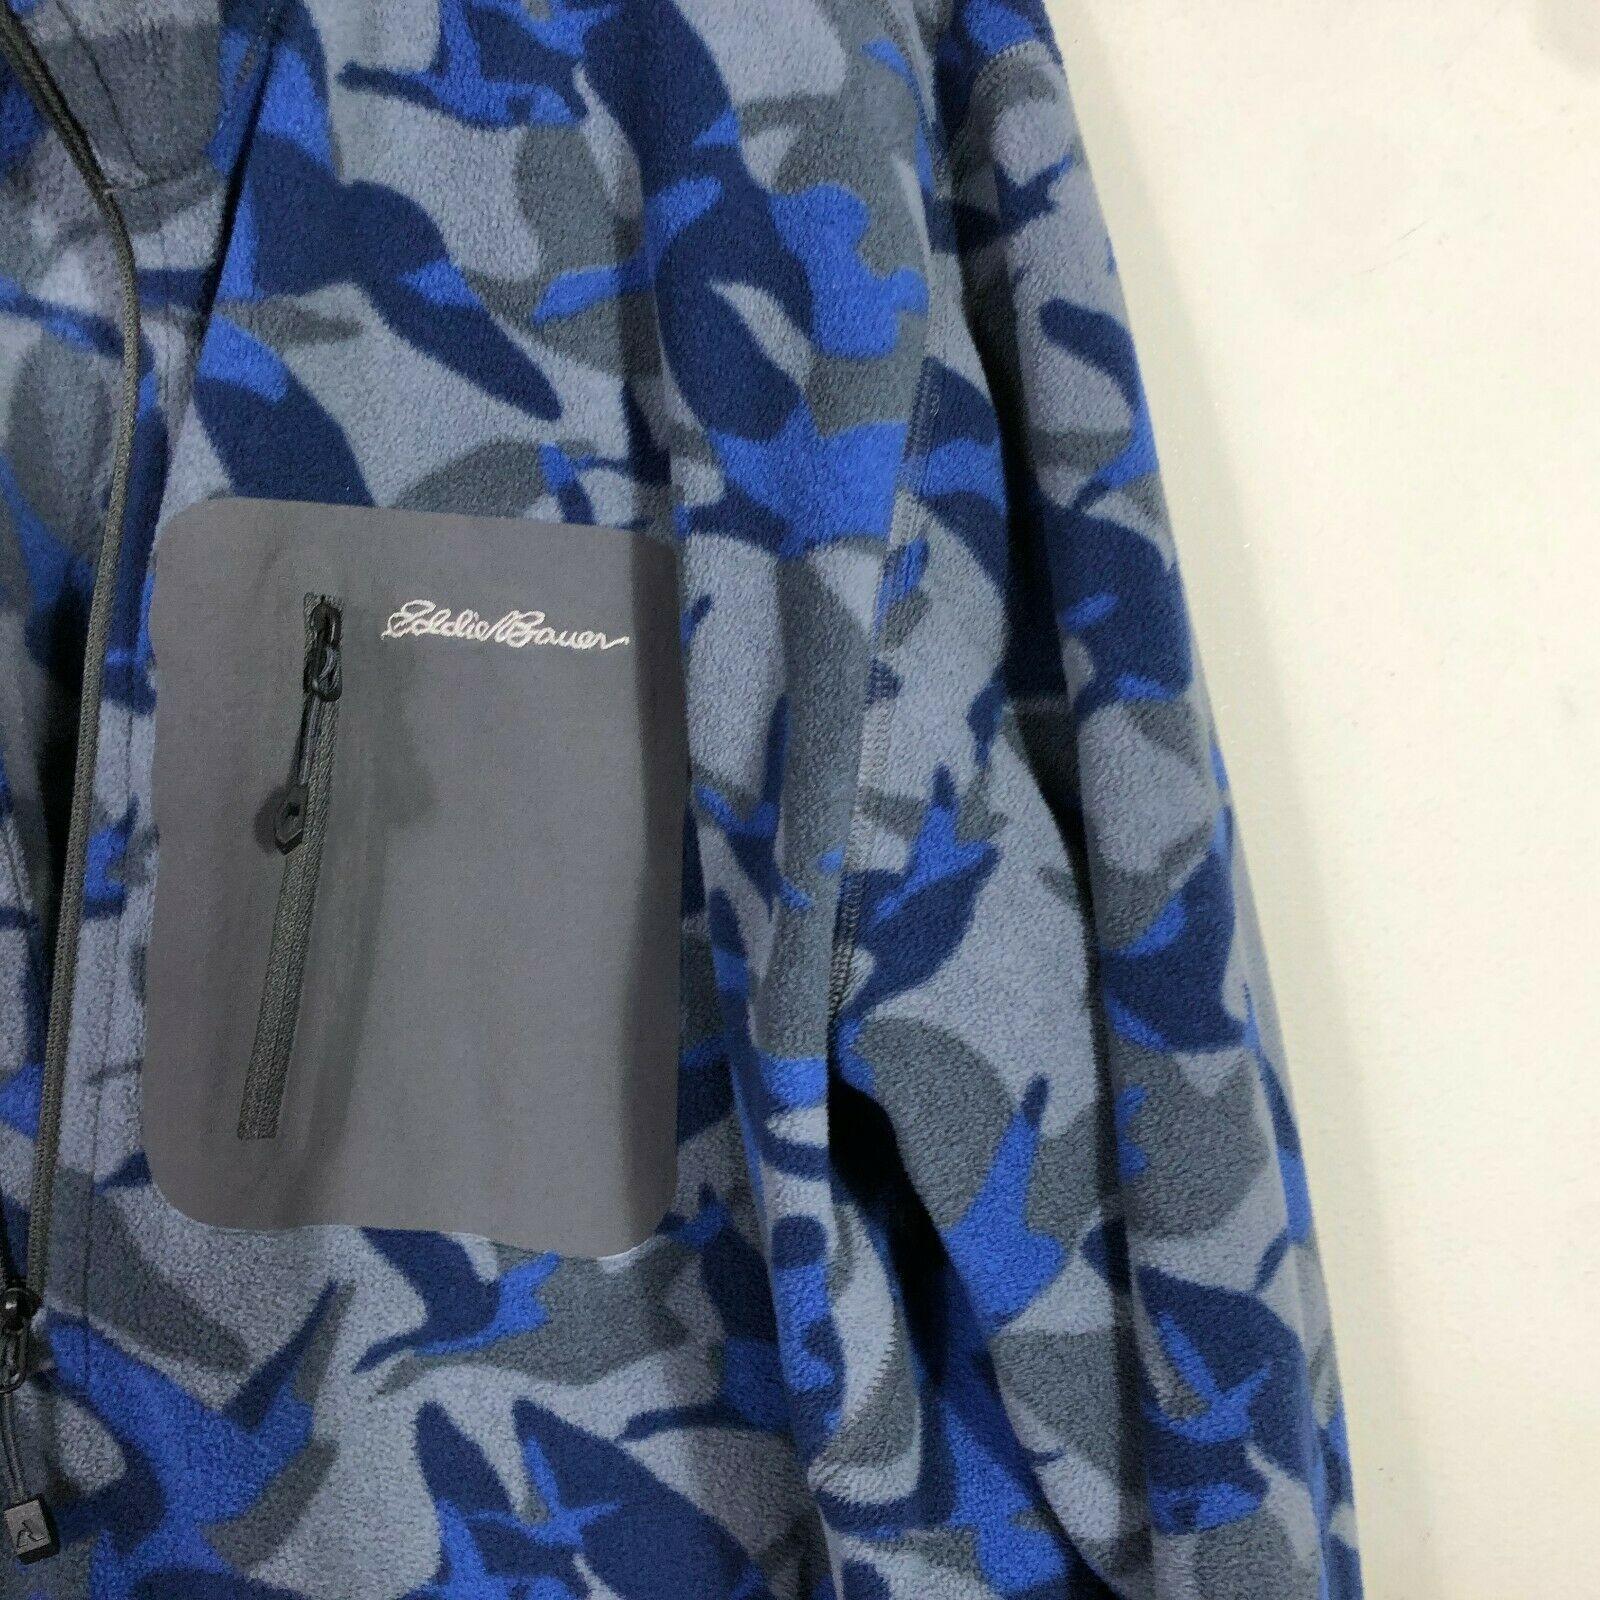 Eddie Bauer First Ascent Fleece Jacket 1/2 Zip Men's 2XL Blue Gray Long Sleeve image 7